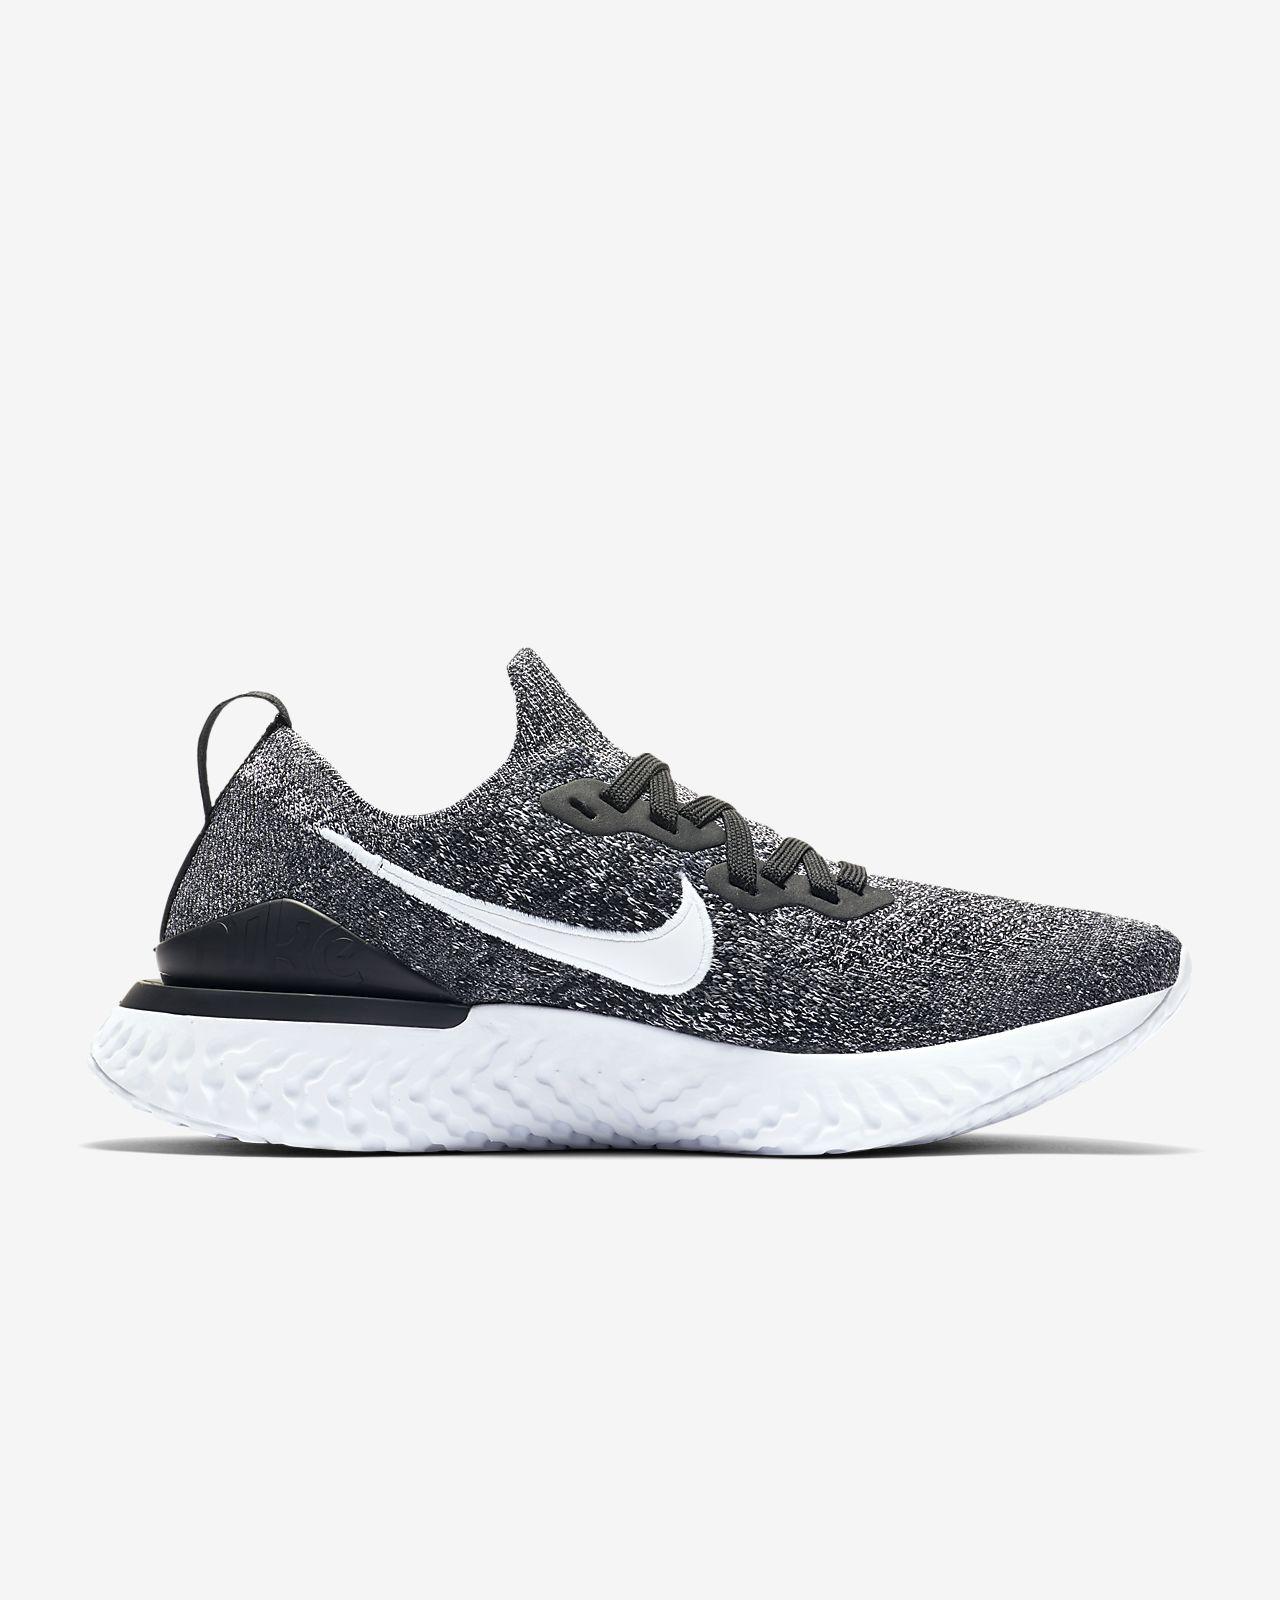 nike pro tights Billig, Nike Air Zoom Odyssey 2